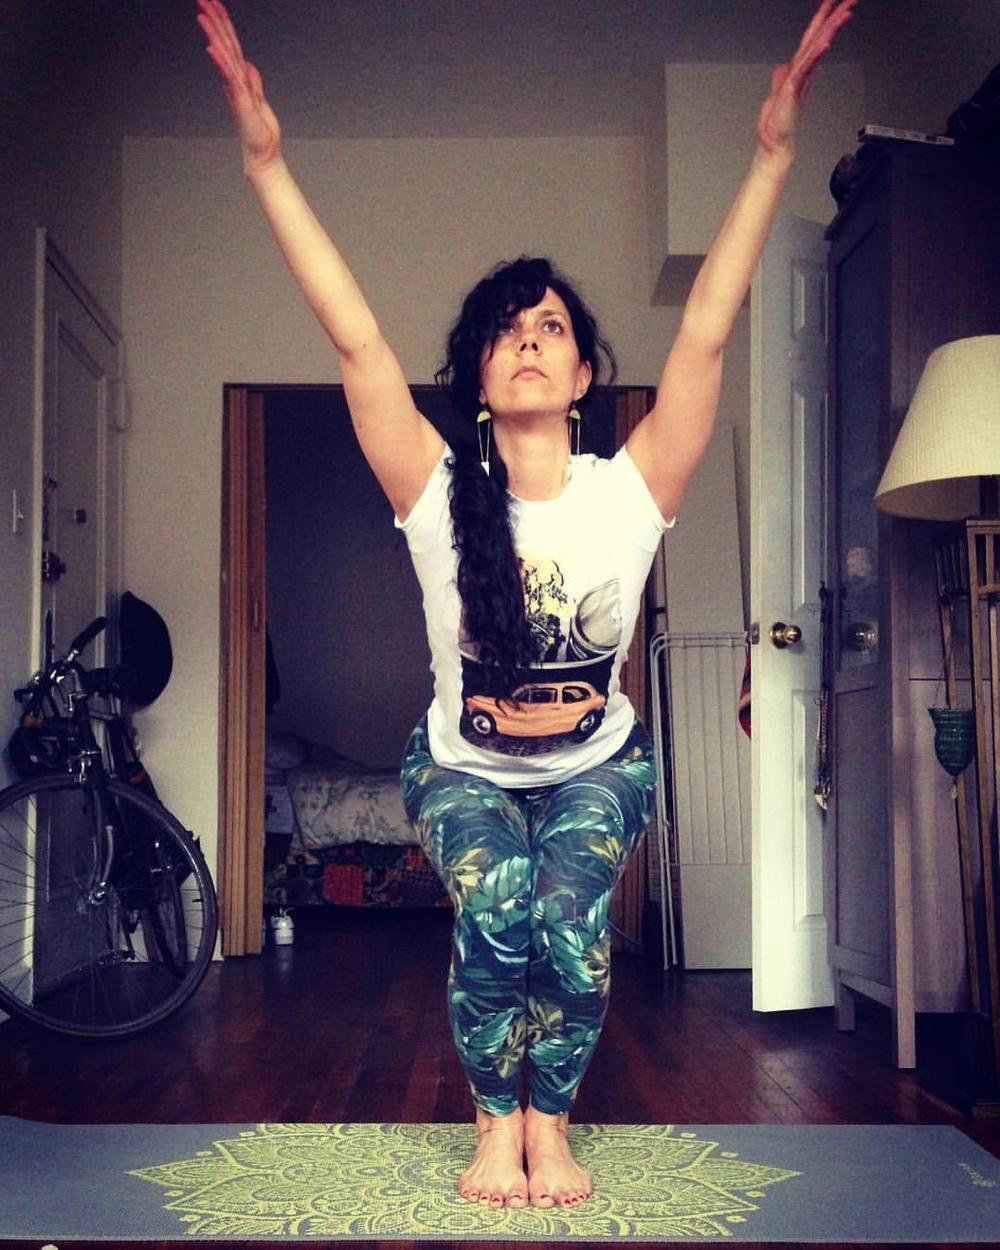 Keep-it-simple-Sunday Yoga Basics @stackedyoga see you at 12pm. 405 Tompkins Ave Bk NY. Utkatasana, fierce pose/awkward pose/ chair pose. #yogaforall #gratitude #springtime #bedstuy #onelove  (at Bedford–Stuyvesant, Brooklyn)